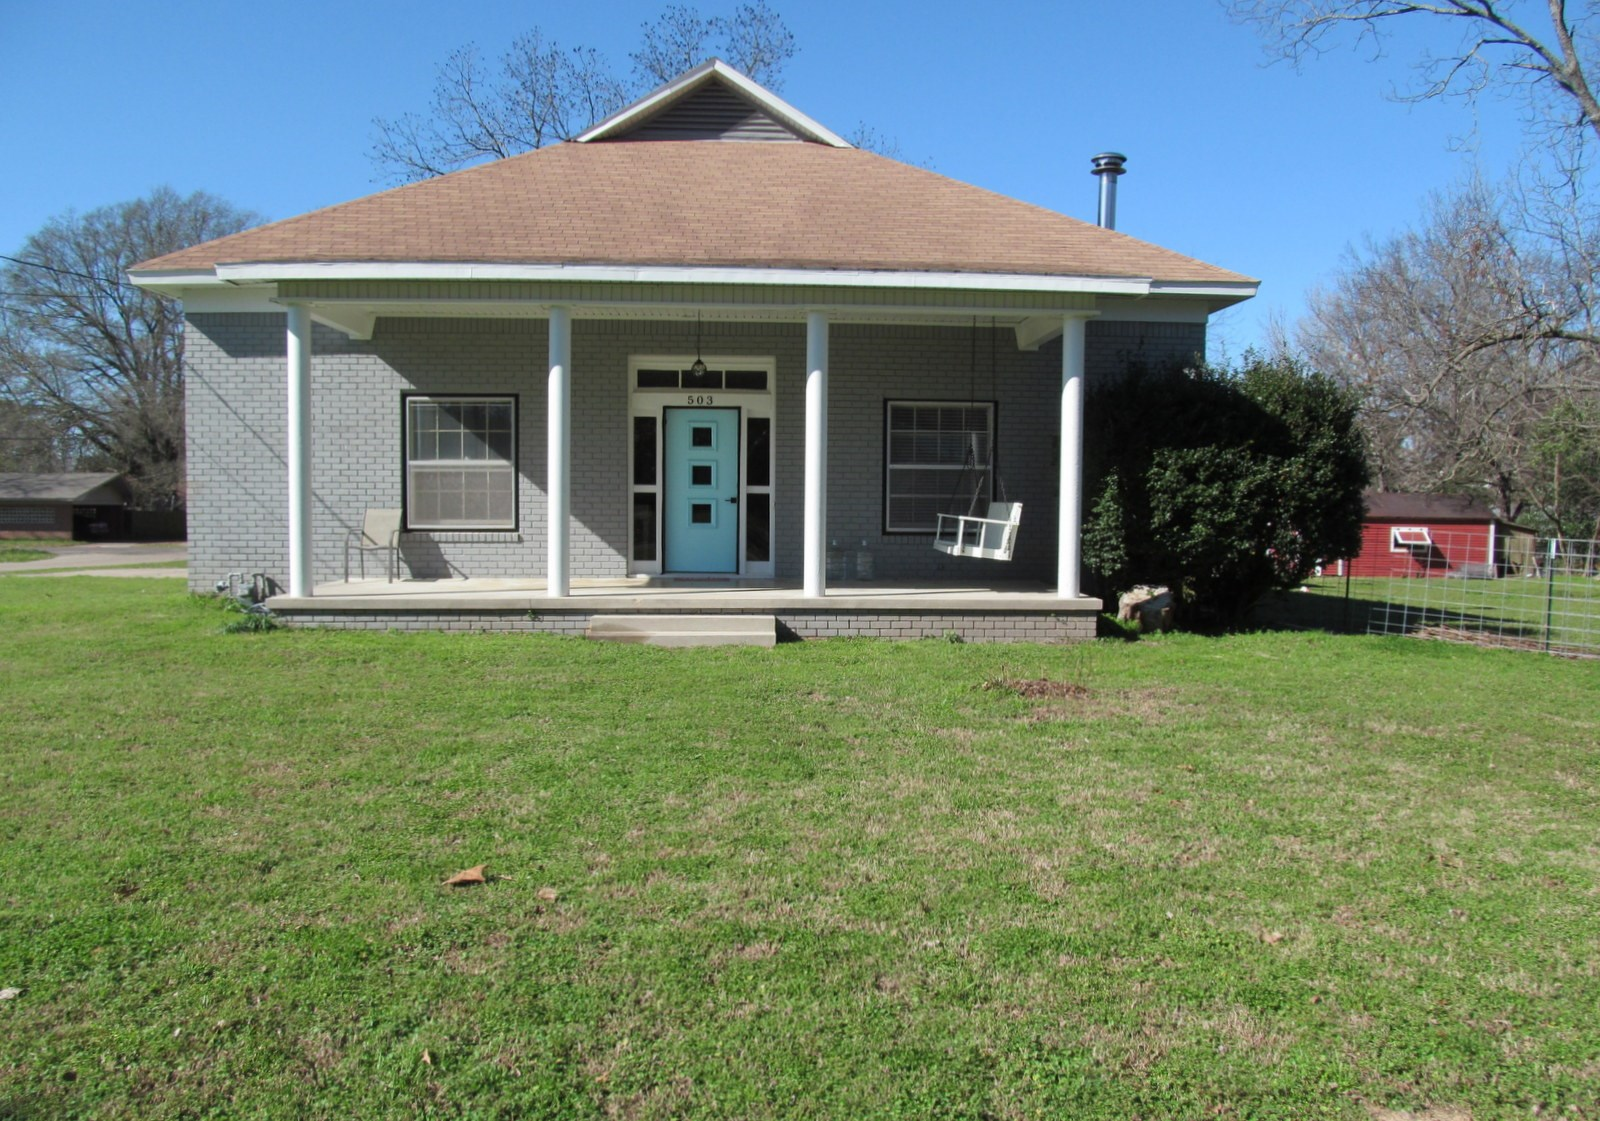 3 BEDROOM - 2 BATH BRICK HOME - WINNSBORO, TEXAS - EAST TX